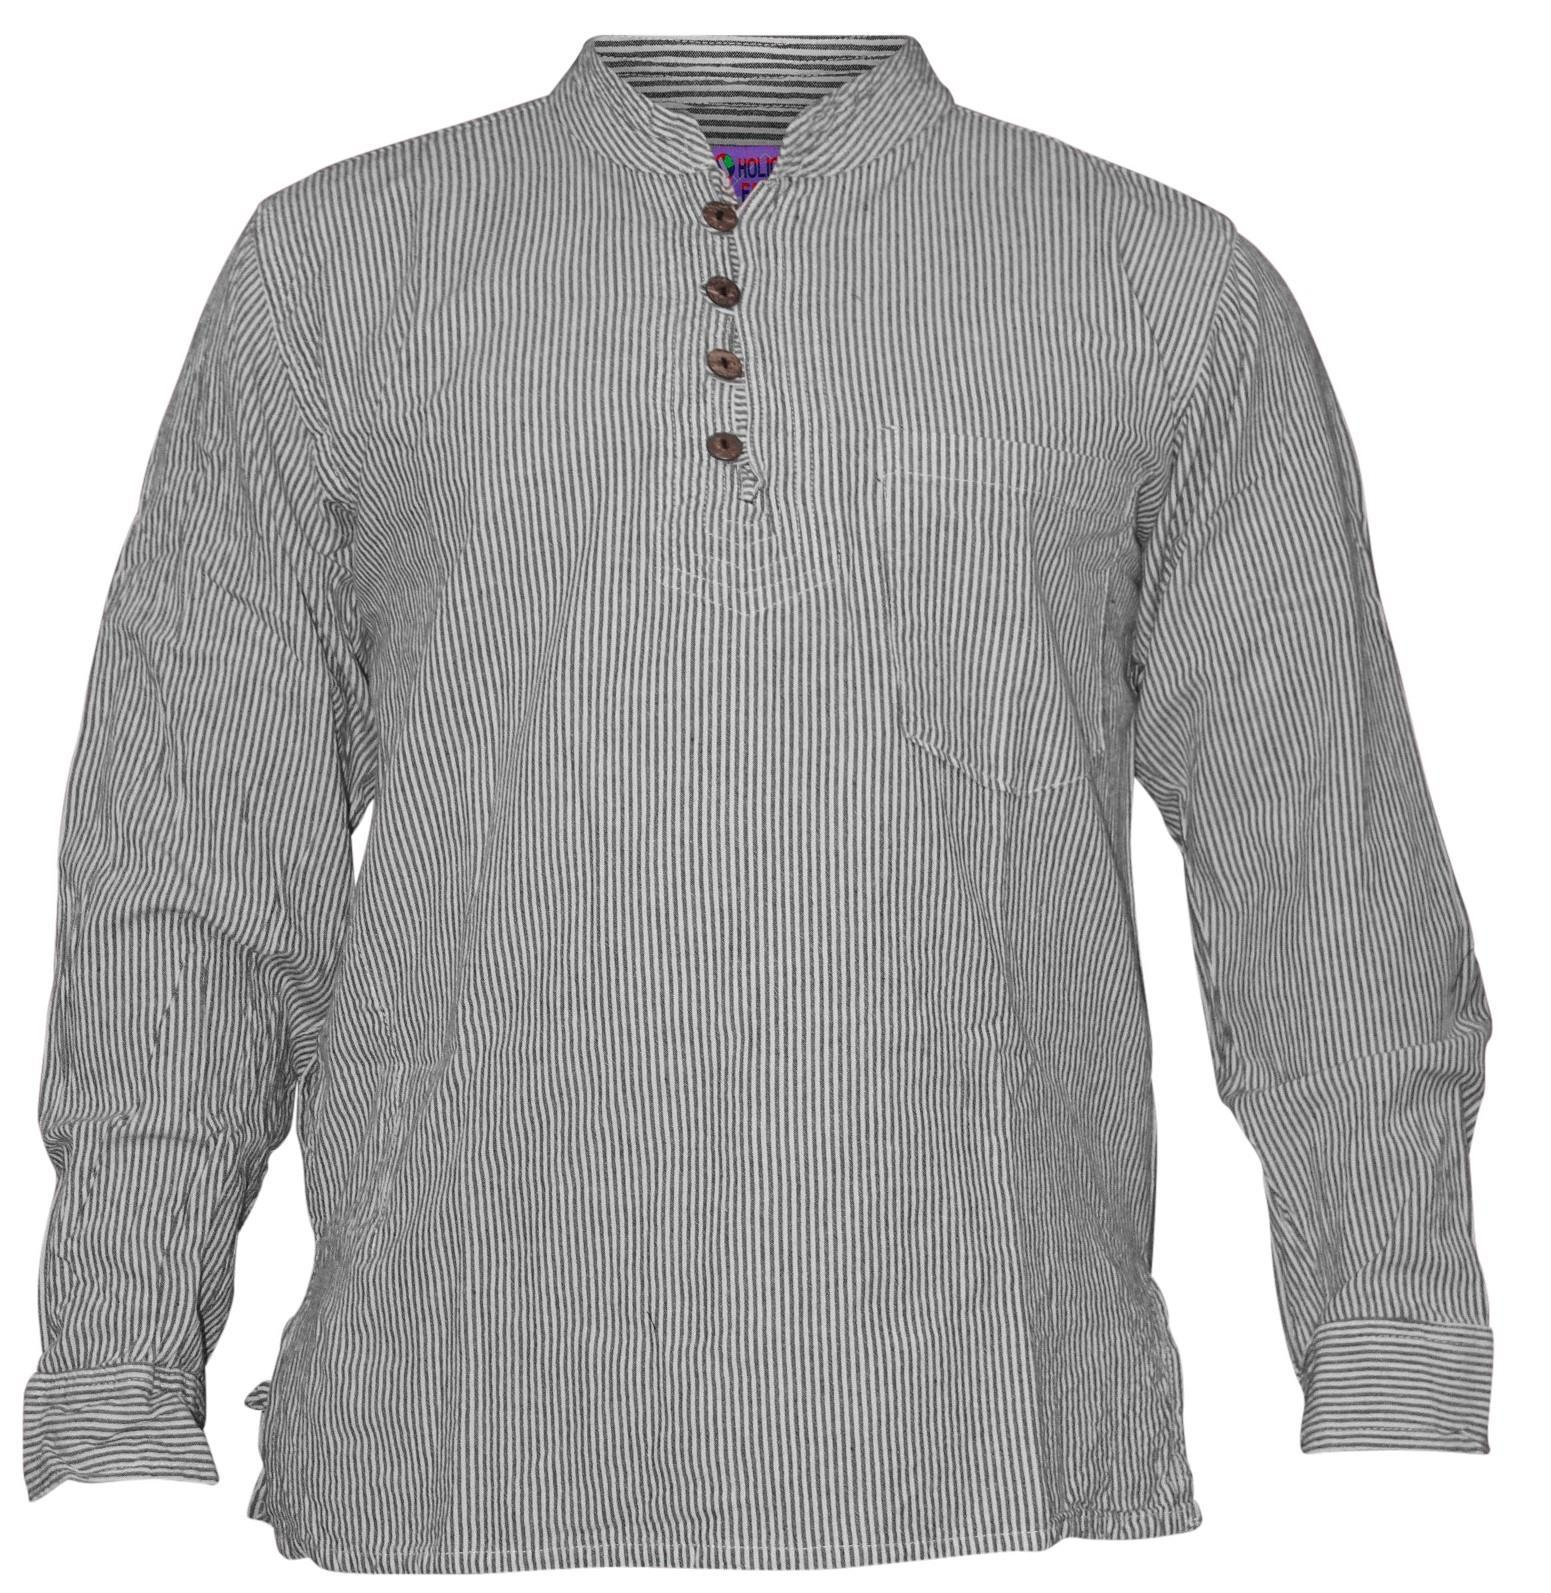 Shopoholic-Fashion-Mens-Summer-Stripy-Shirt-Full-Sleeve-Hippie-Tops thumbnail 3